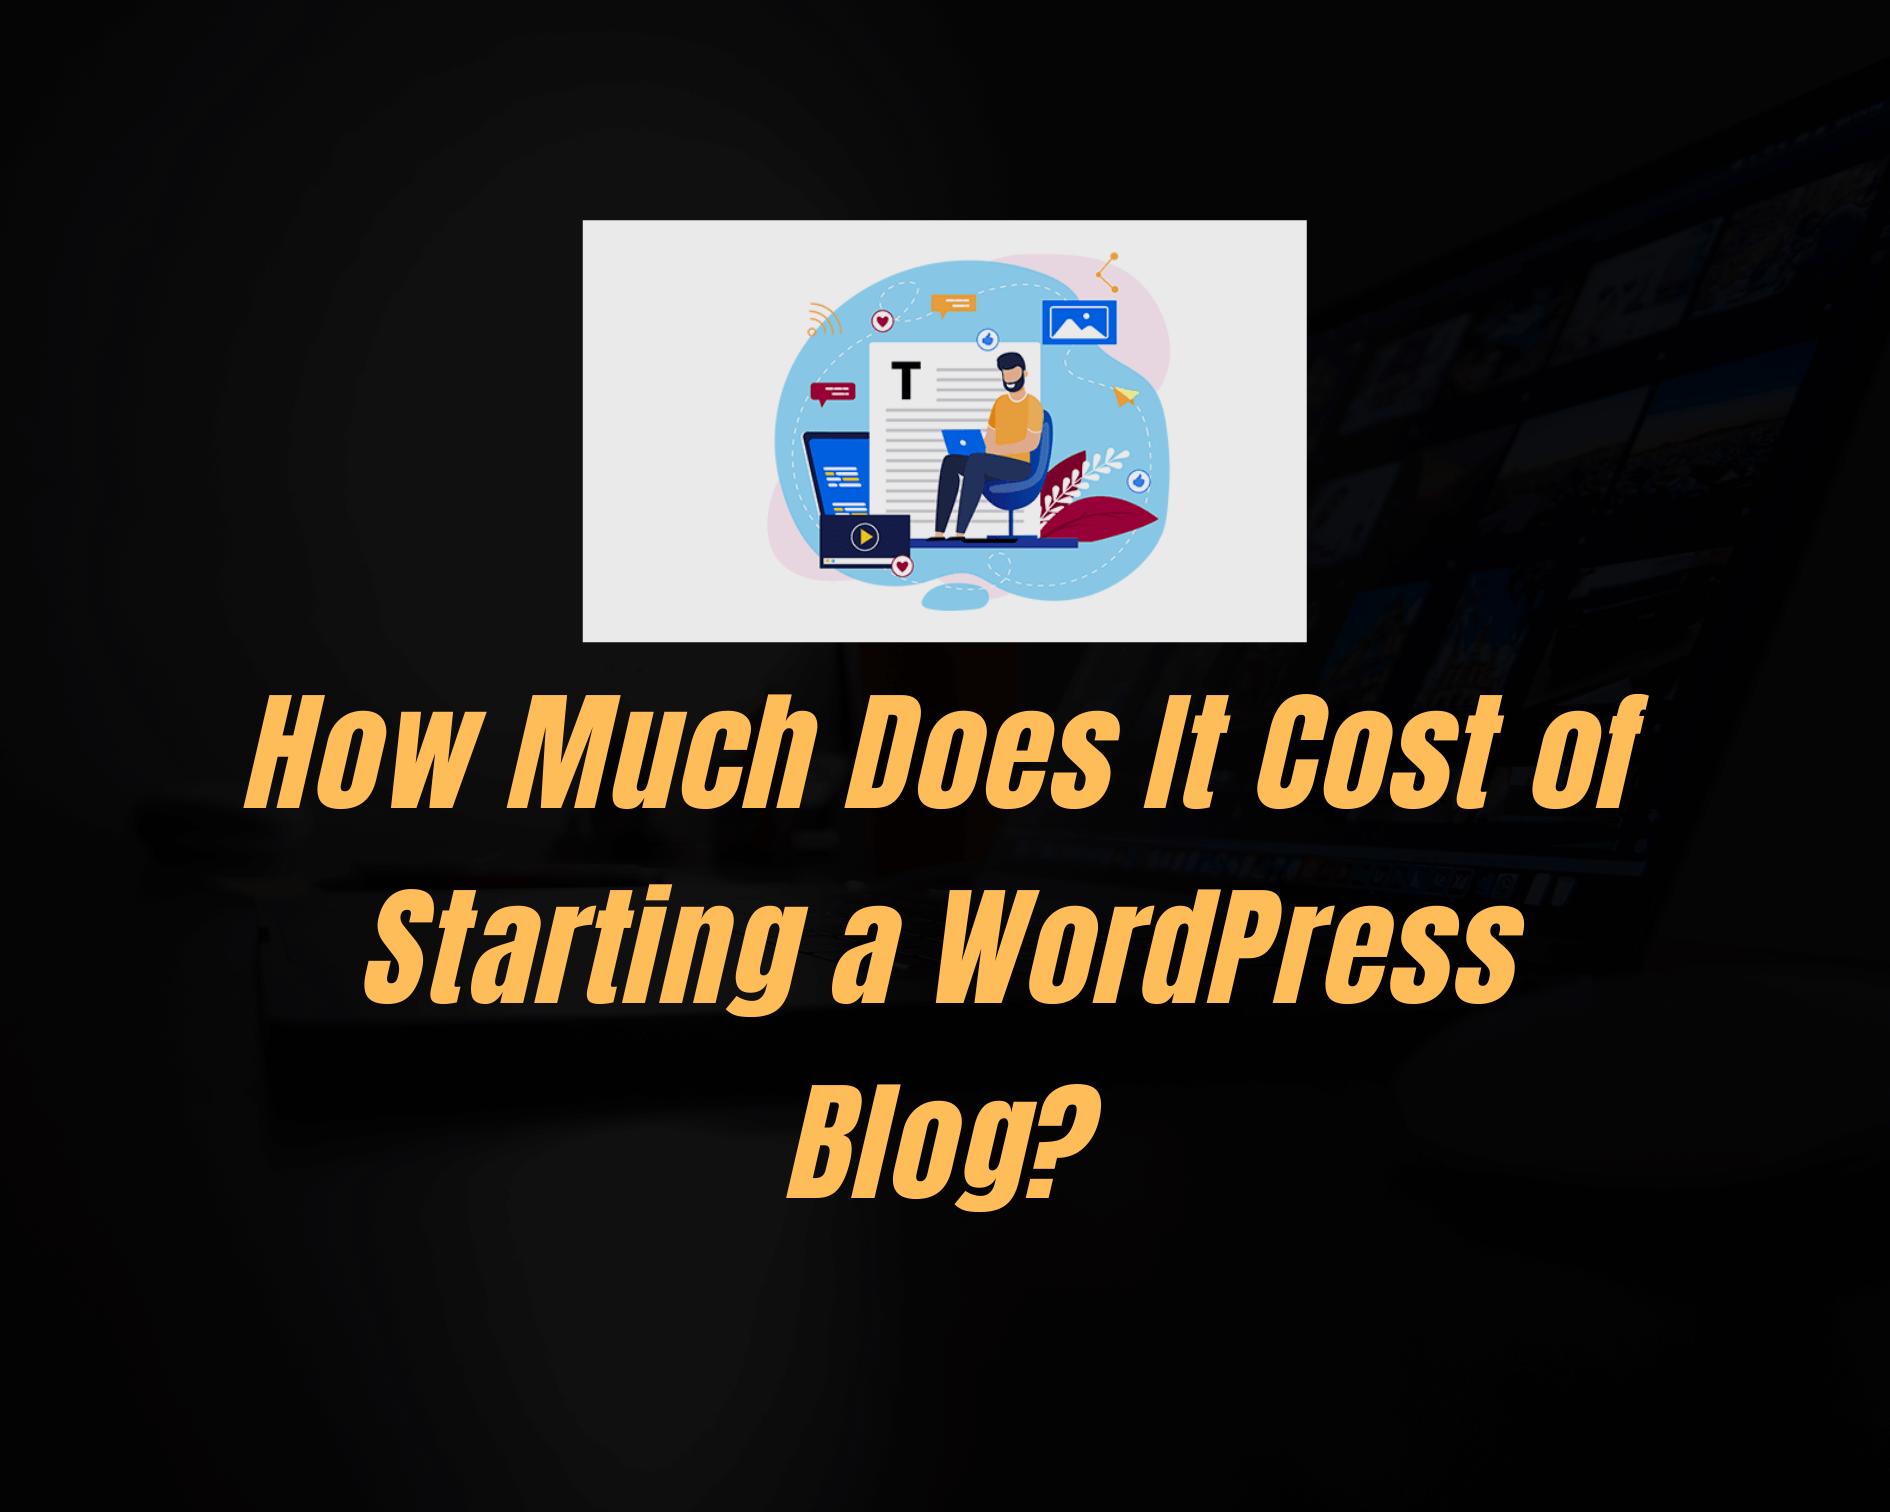 Cost of starting a wordpress blog